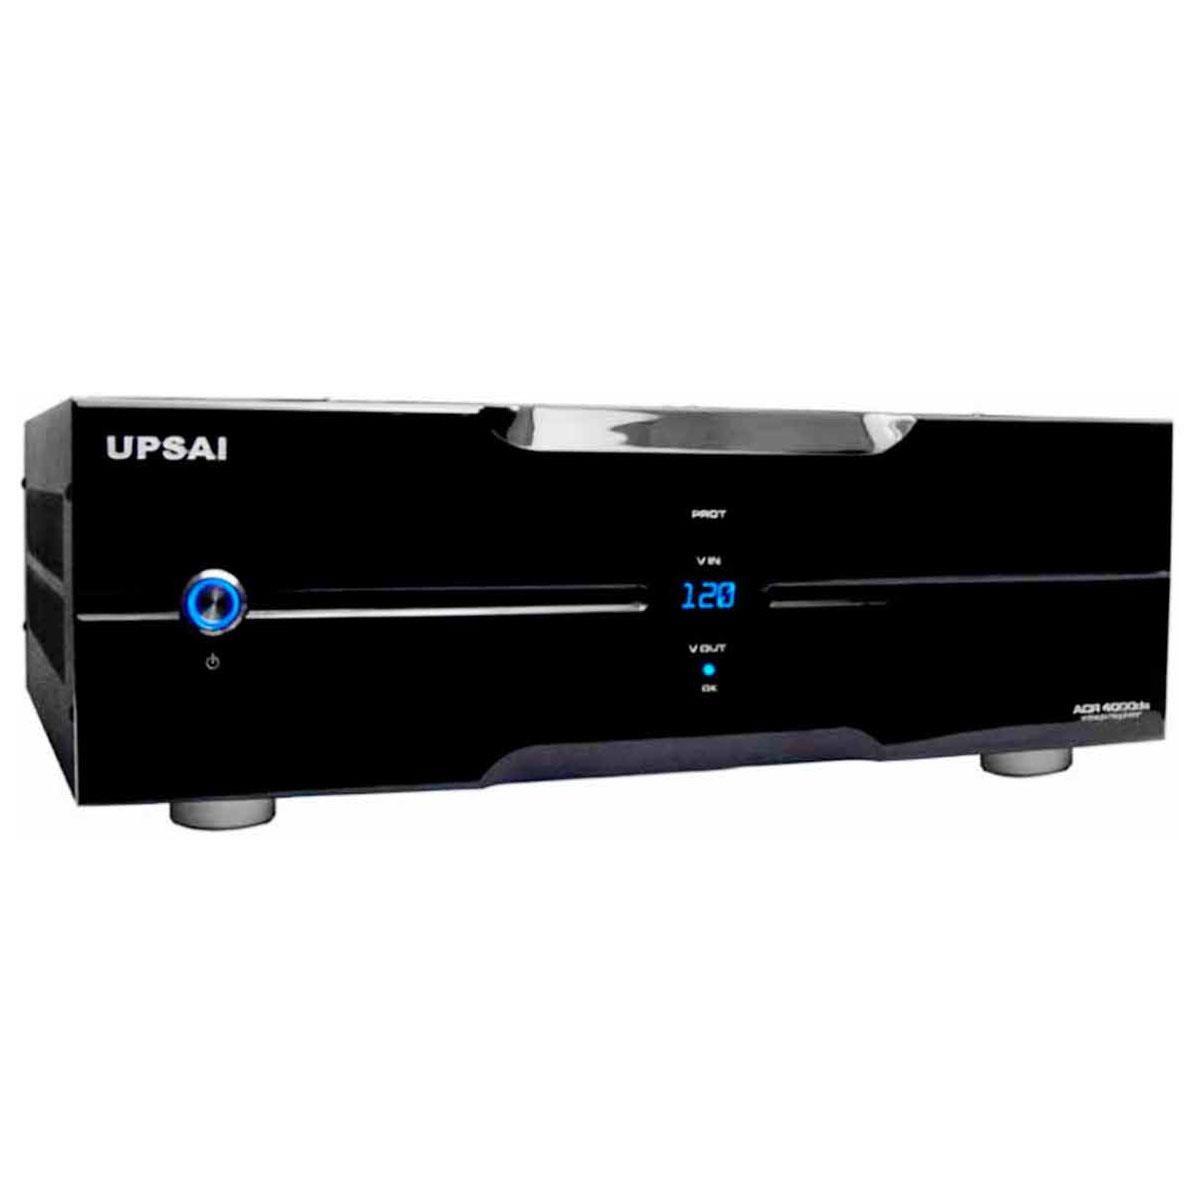 Condicionador de Energia Estabilizado 3100VA 110V ACR 4000ds - Upsai